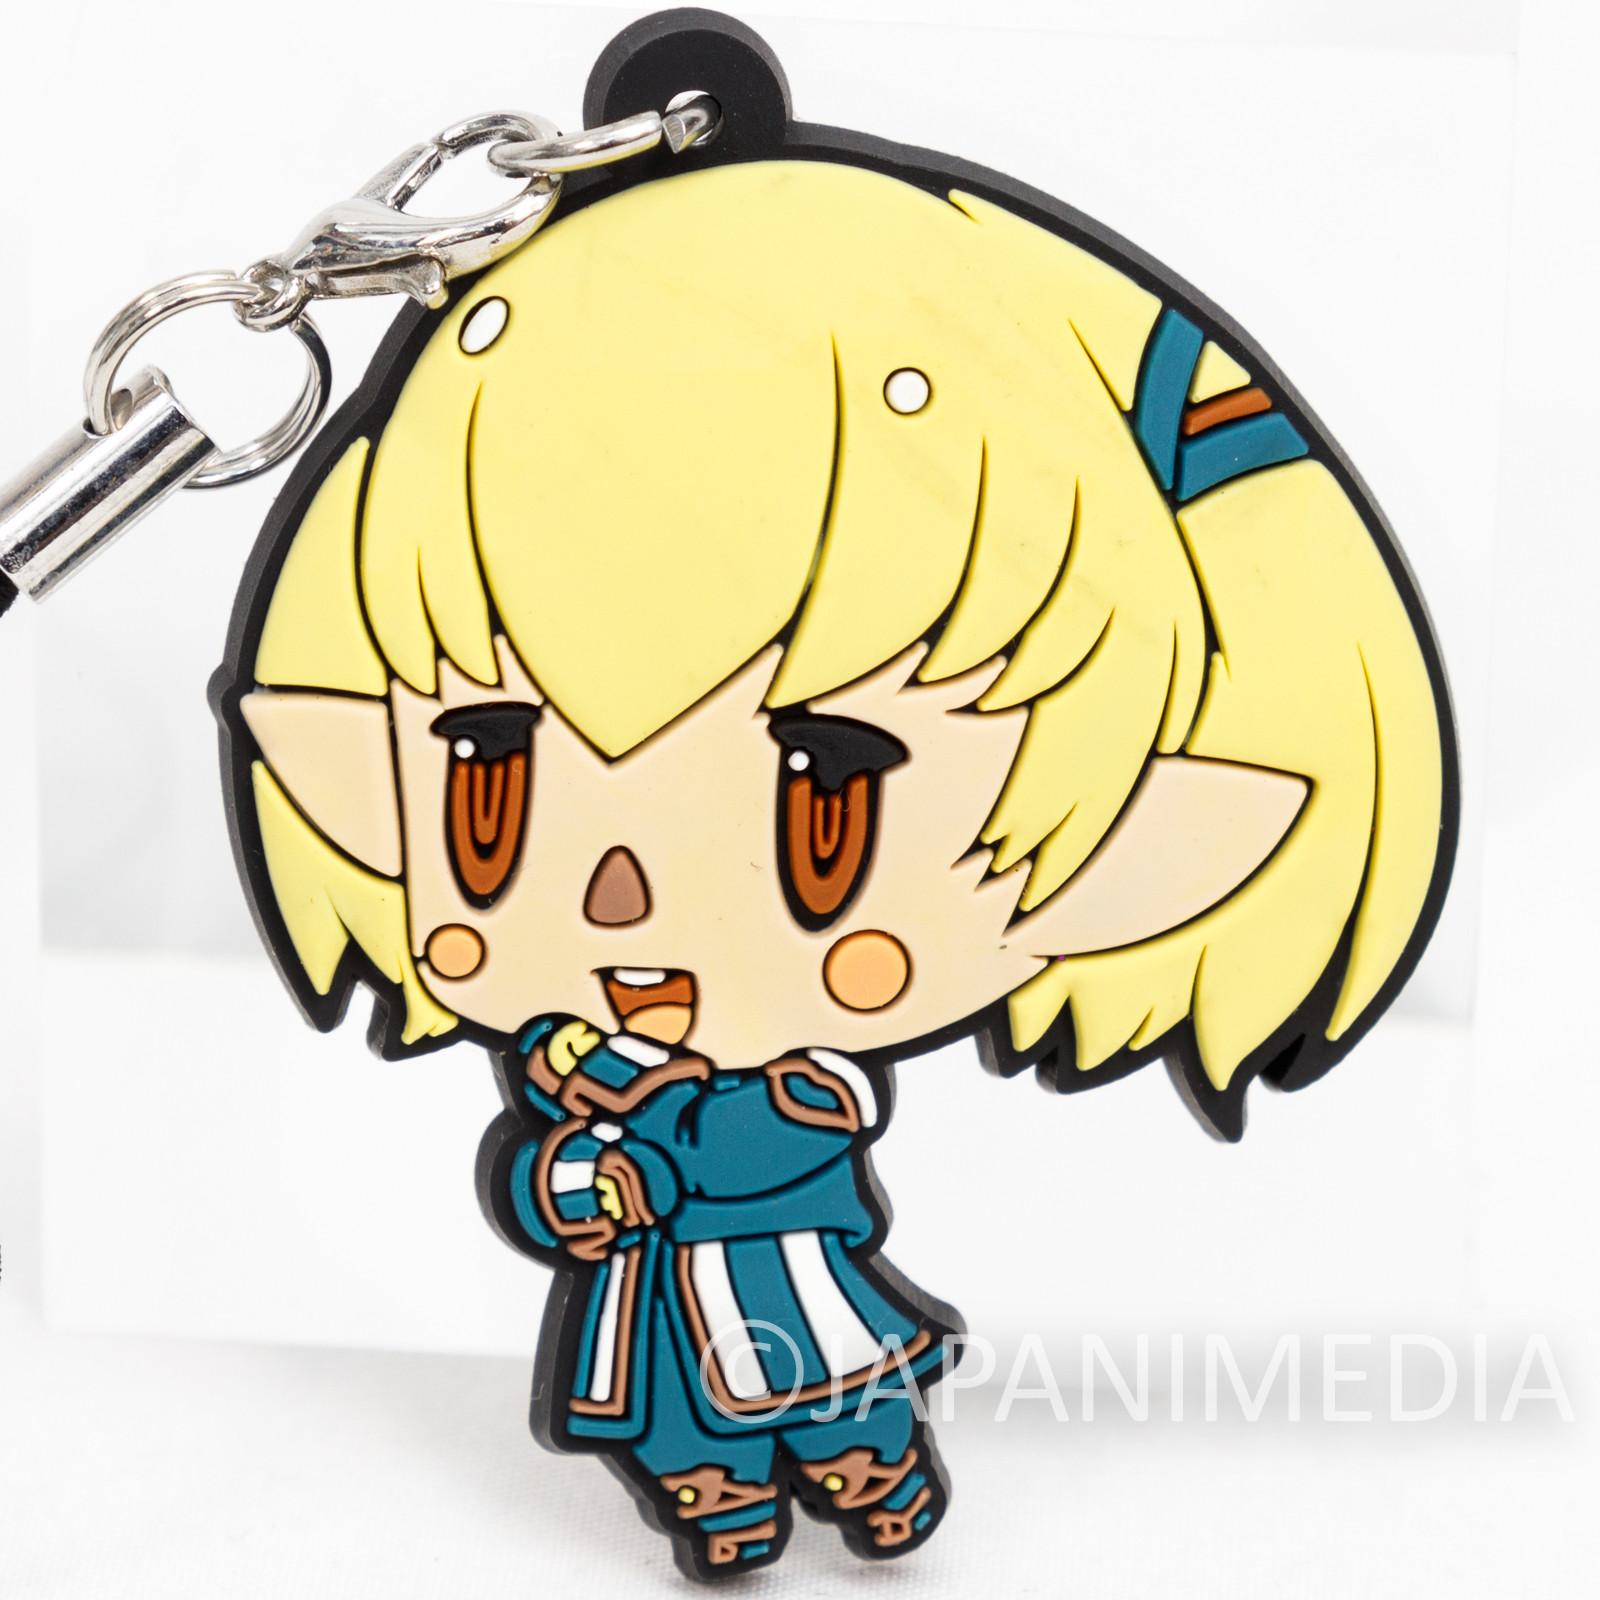 Final Fantasy Shantotto Mascot Rubber Strap JAPAN SQUARE ENIX